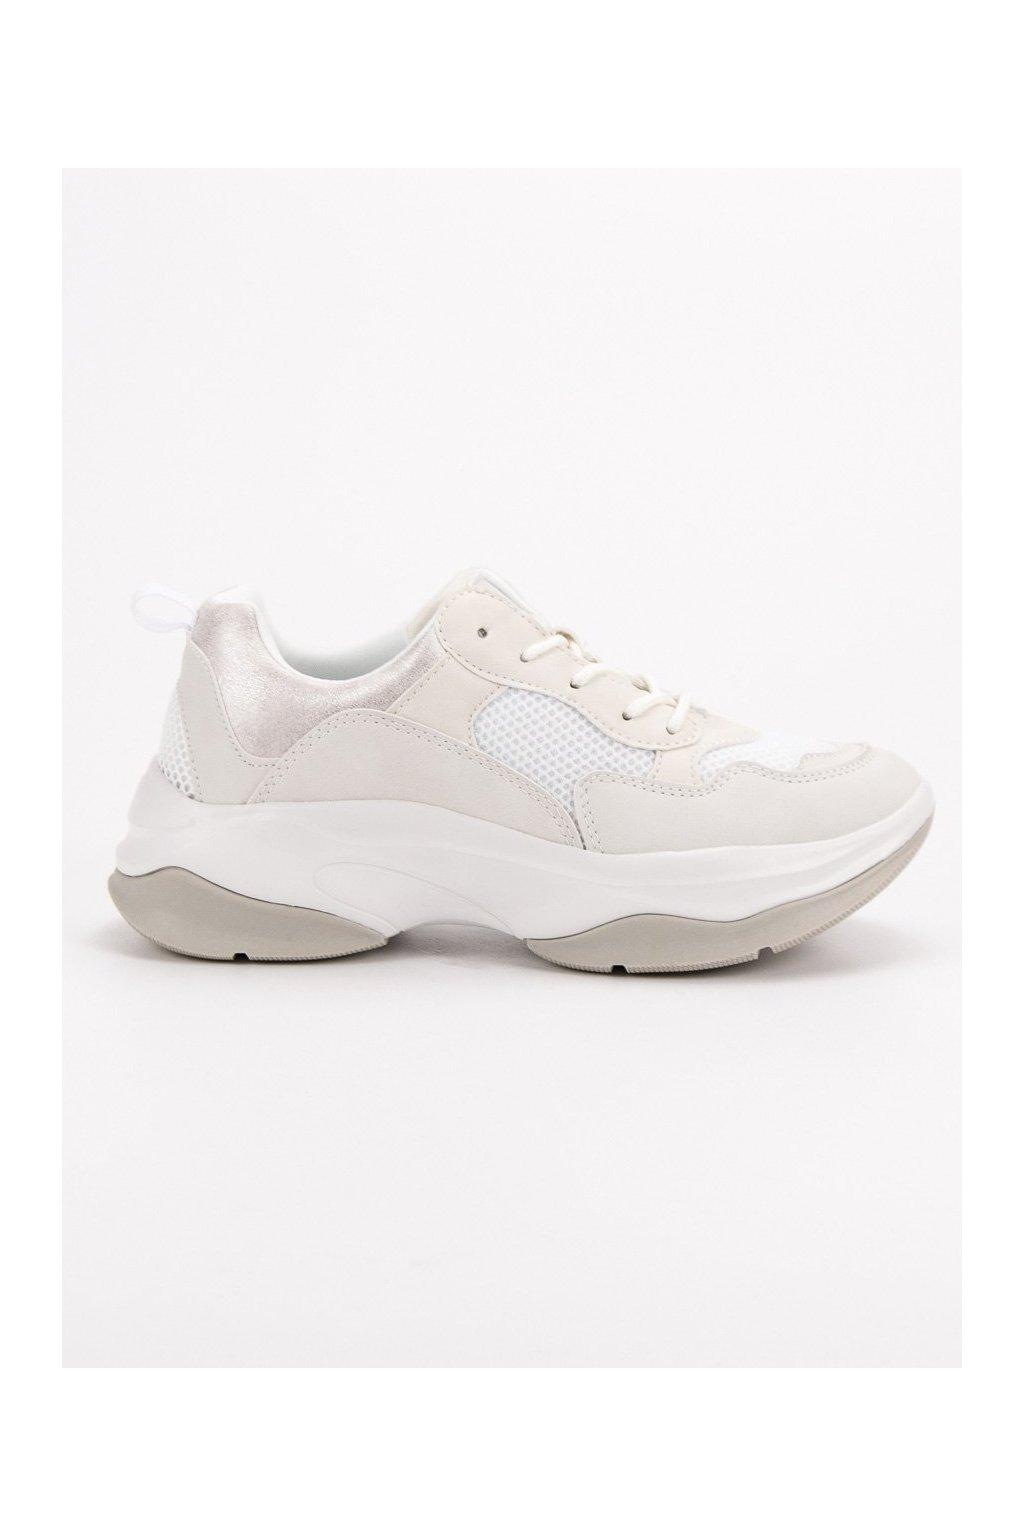 Módne biele tenisky sneakers Kylie